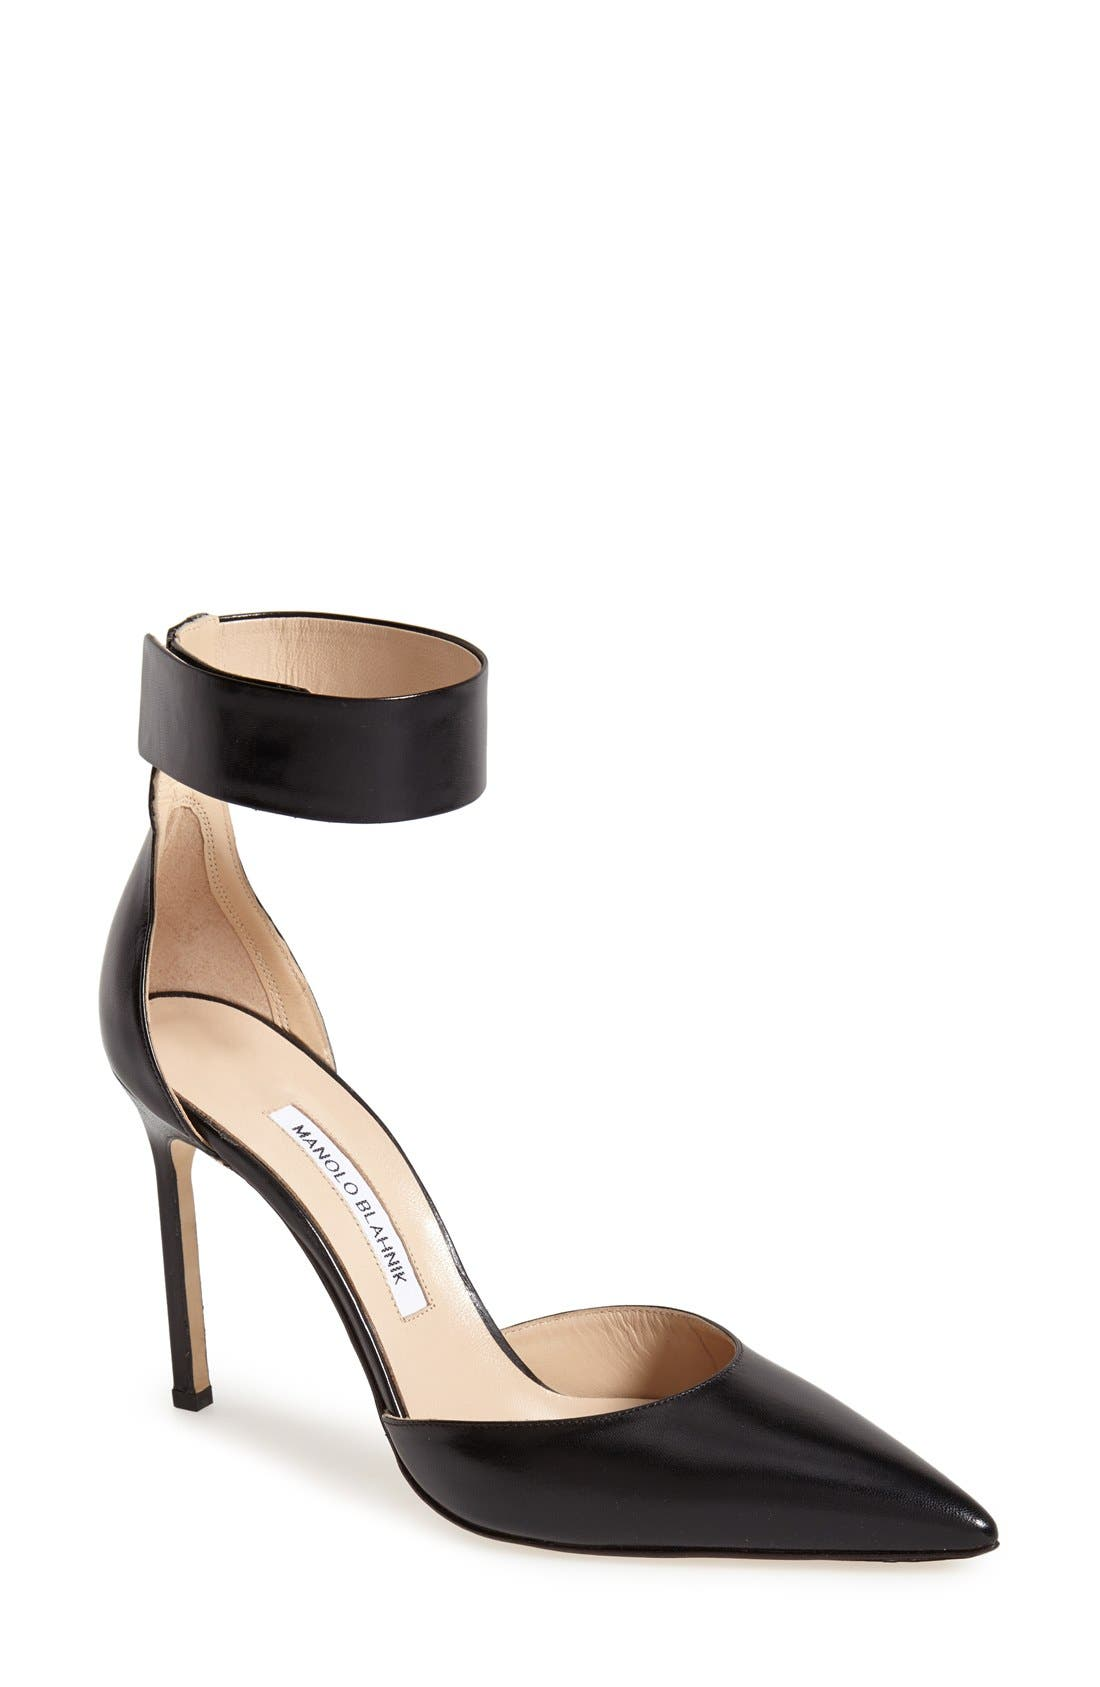 Main Image - Manolo Blahnik 'Ollico' Ankle Cuff d'Orsay Pump (Women)